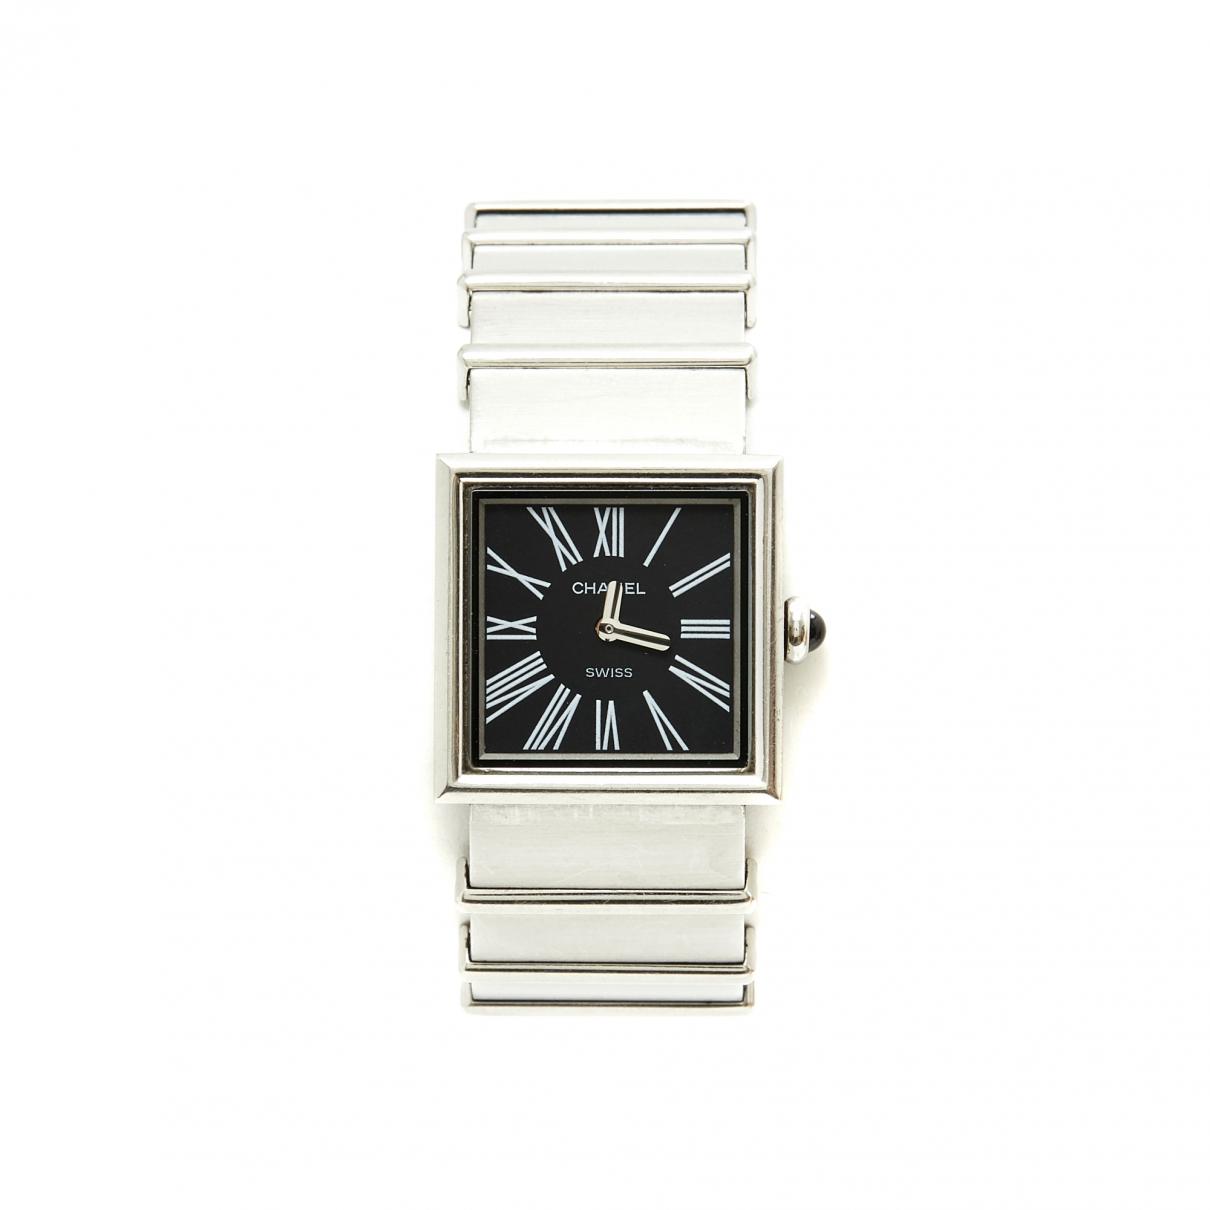 Chanel Mademoiselle Uhr in  Silber Stahl